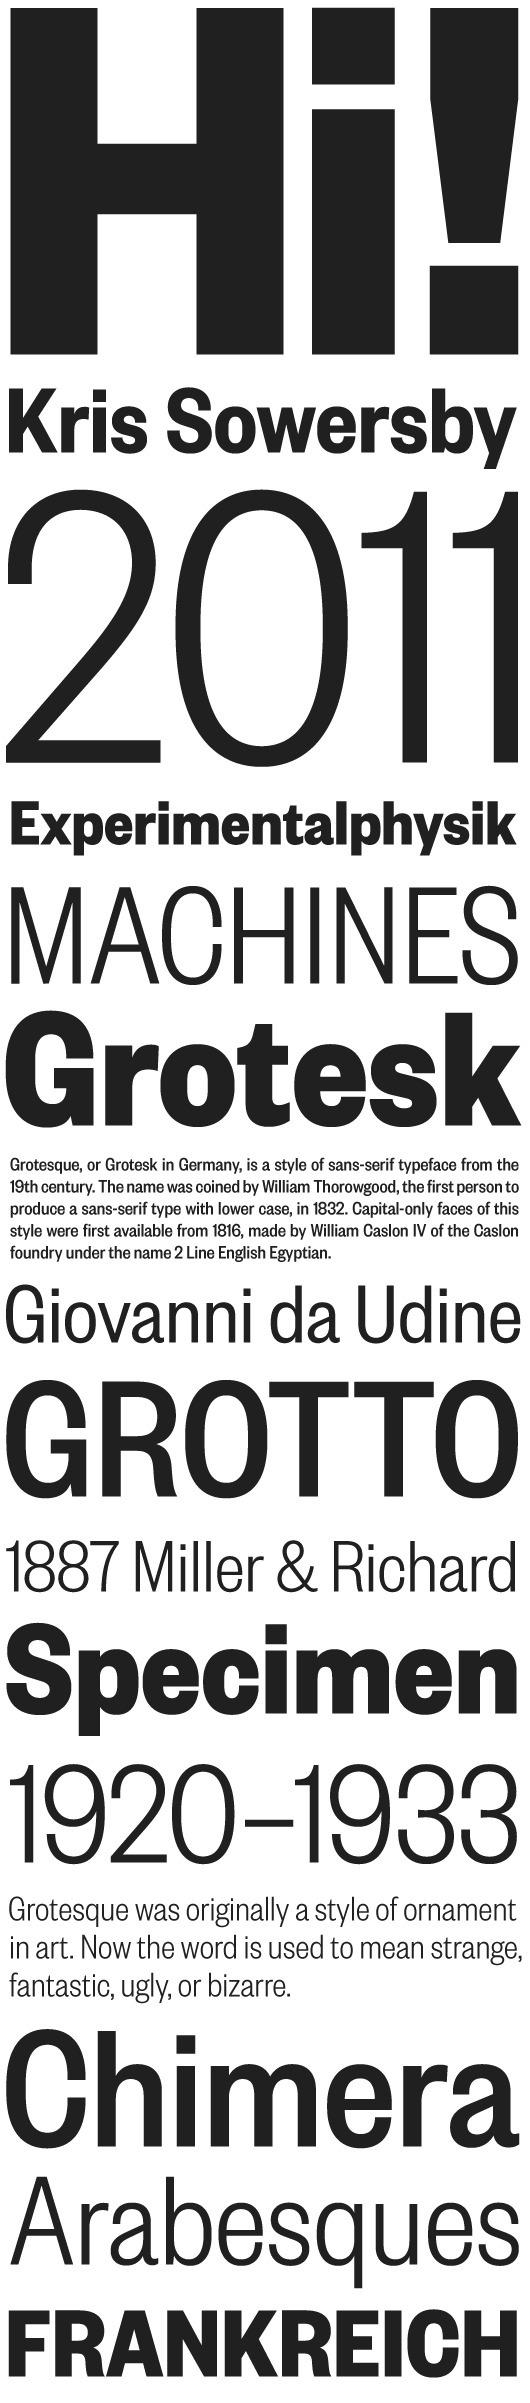 Founders Grotesk Condensed by Kris Sowersby #font #serif #sans #klim #type #typography